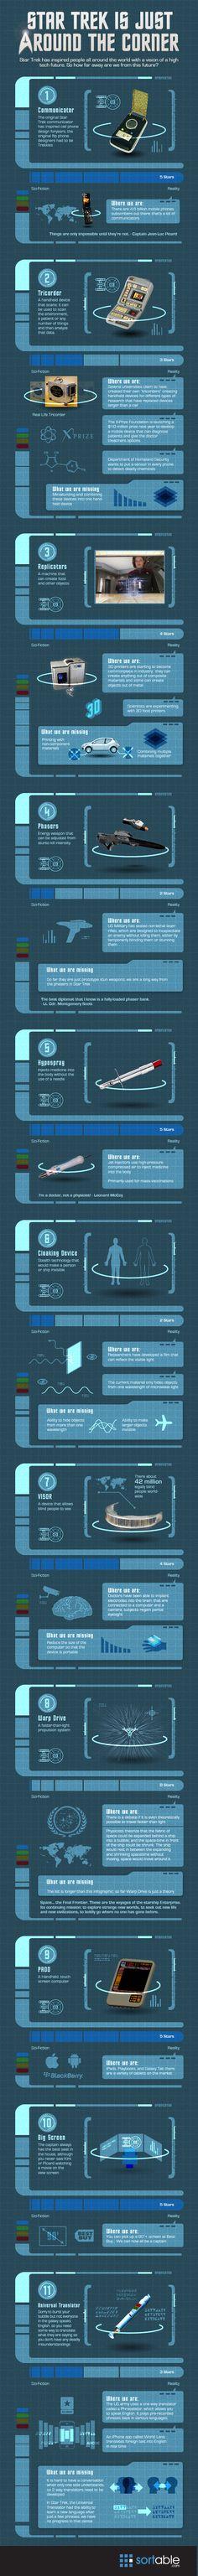 Star Trek Technology: talvolta la realtà supera la fantasia... Certo mancano ancora teletrasporto e warp drive :)